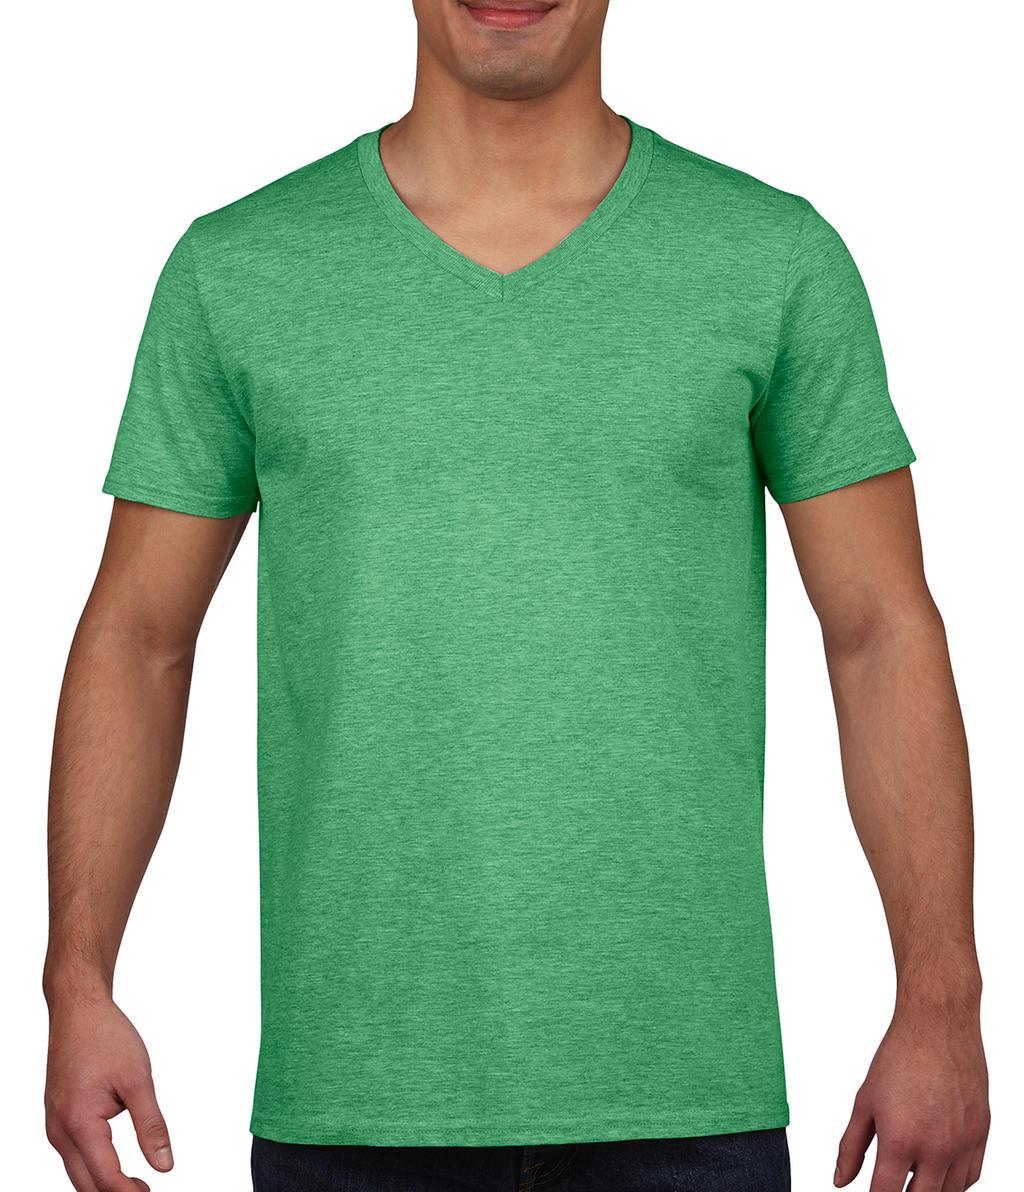 Gildan soft style v neck t shirt shirt s xxl in mehreren for Gildan t shirt styles